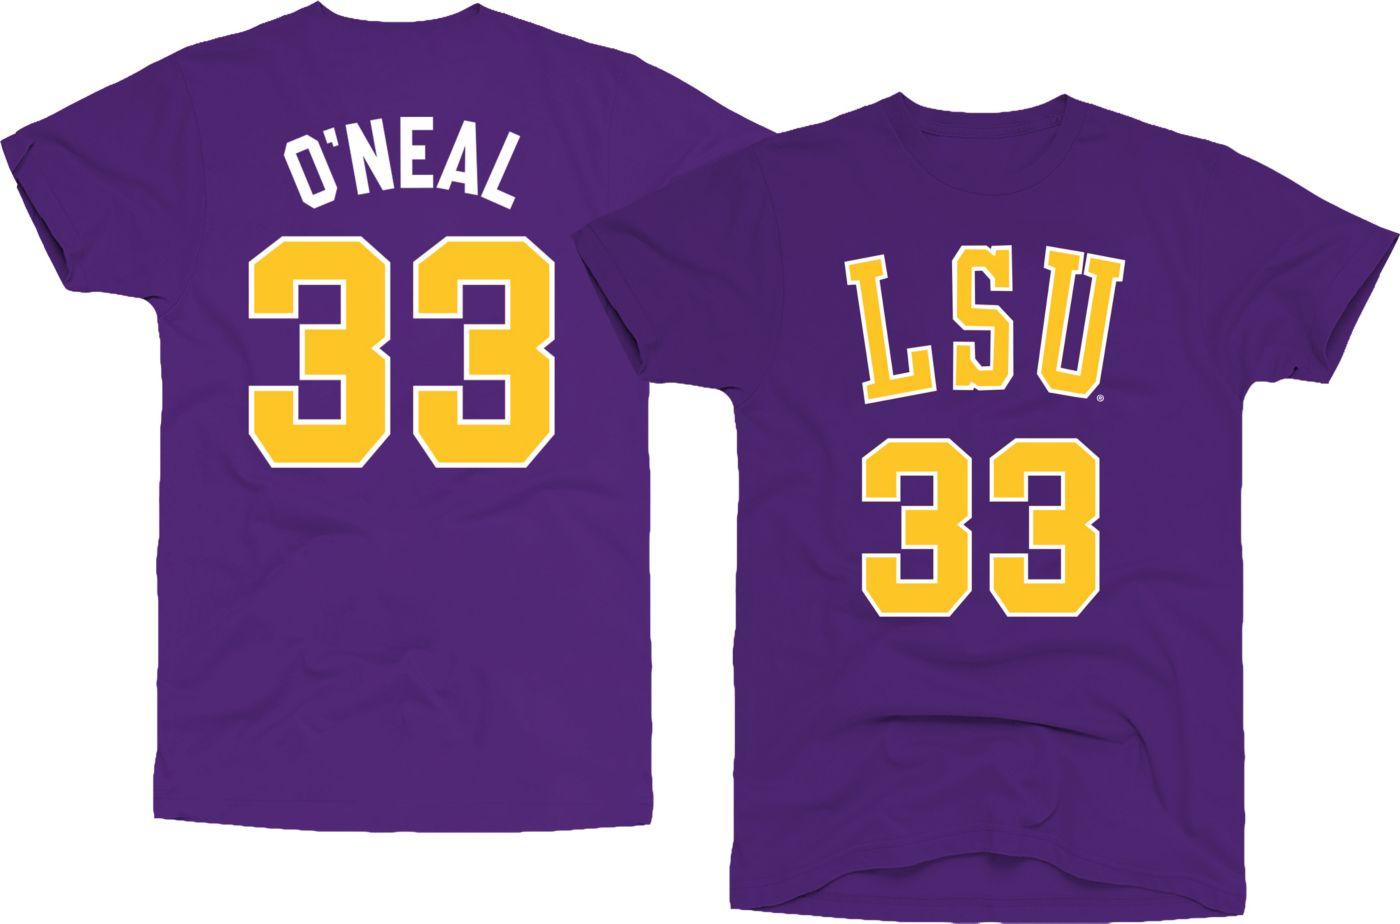 Original Retro Brand Men's LSU Tigers Shaquille O'Neal #33 Purple Basketball Jersey T-Shirt